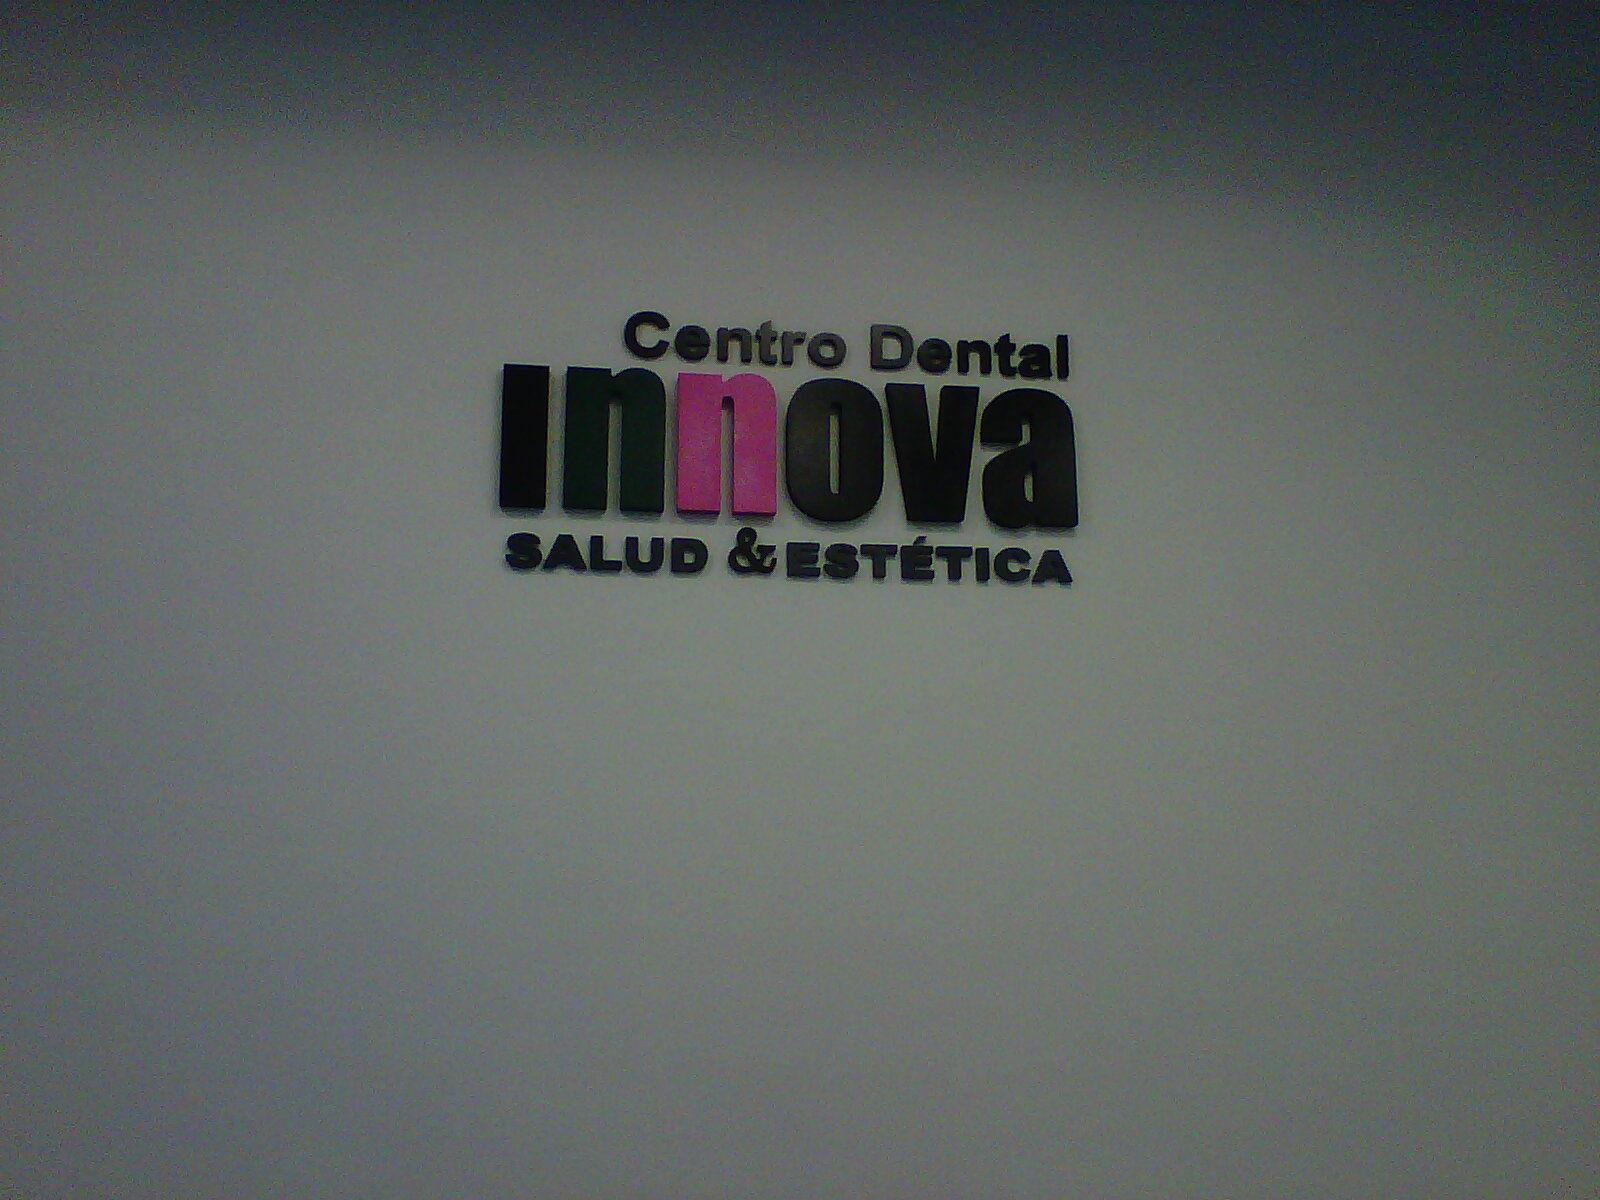 Foto 22 de Dentistas en Avilés | Centro Dental Innova